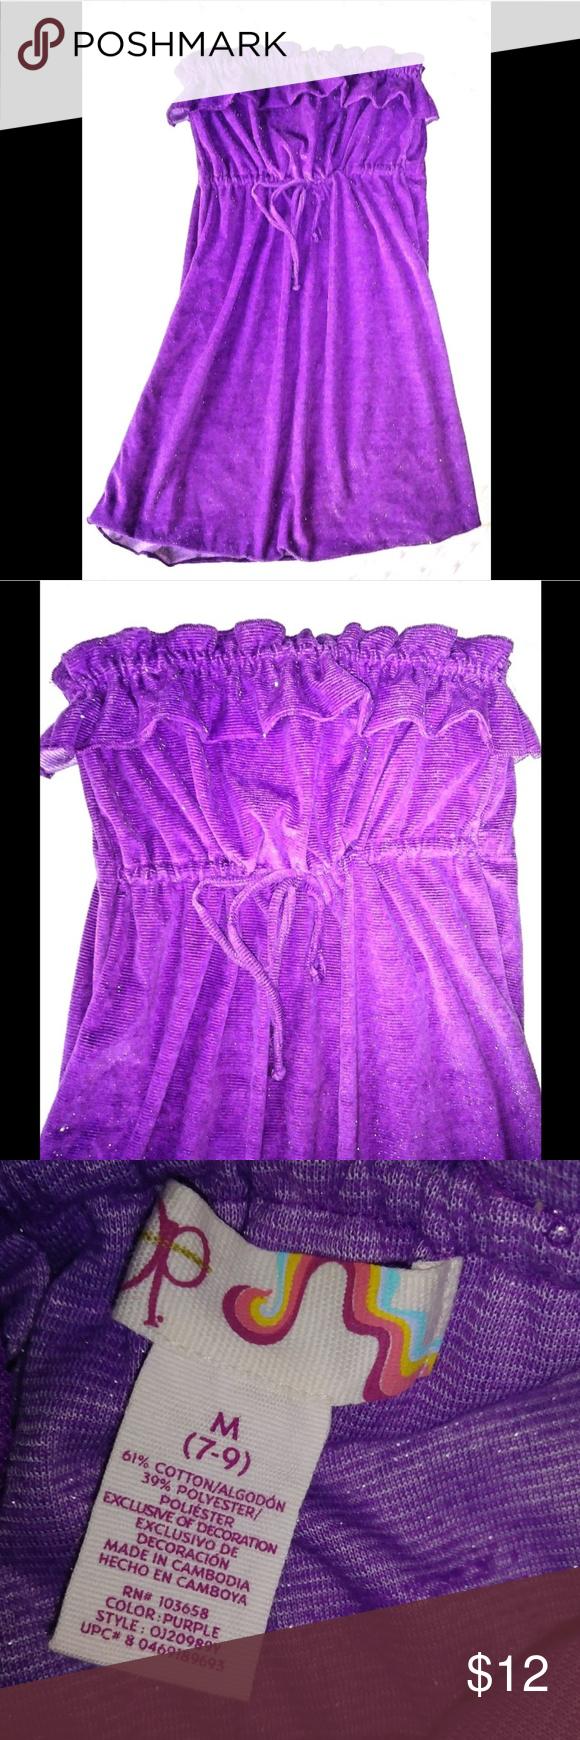 6a1c93a7b5 🌸4 for  25 OP swimsuit cover up size M Juniors OP lavender swim suit cover